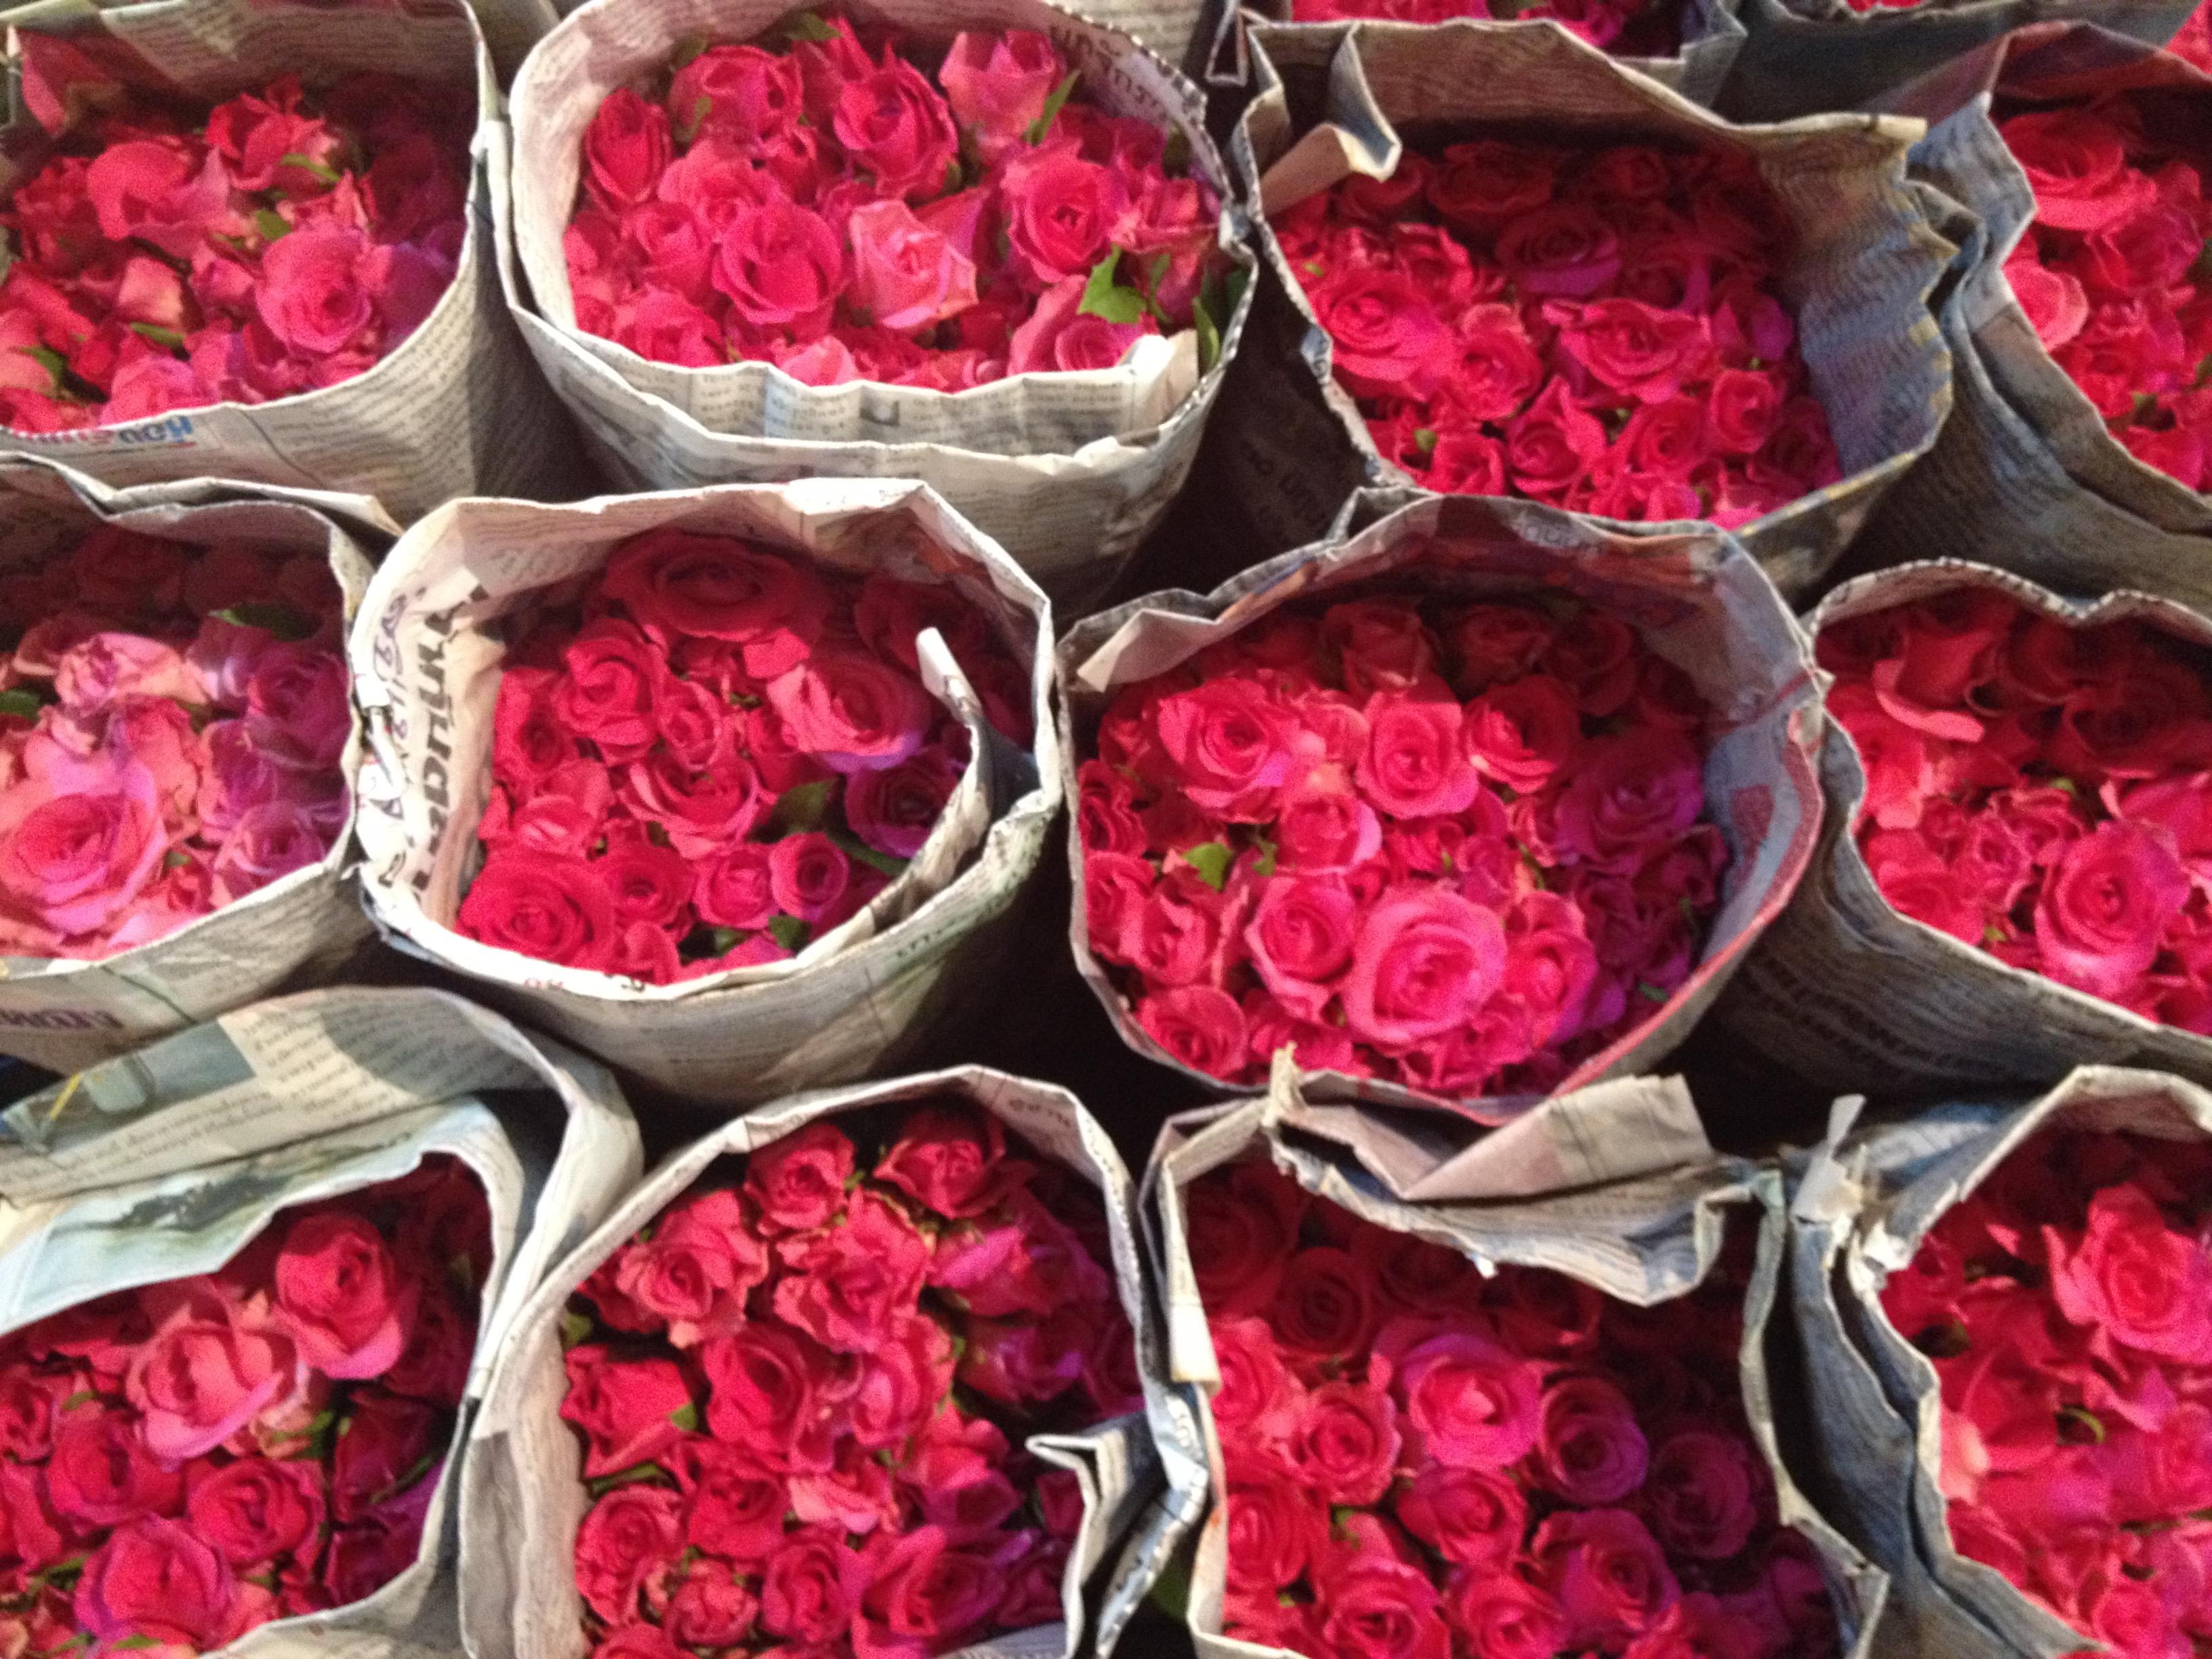 Rose al mercato dei fiori, Bangkok @oltreilbalcone